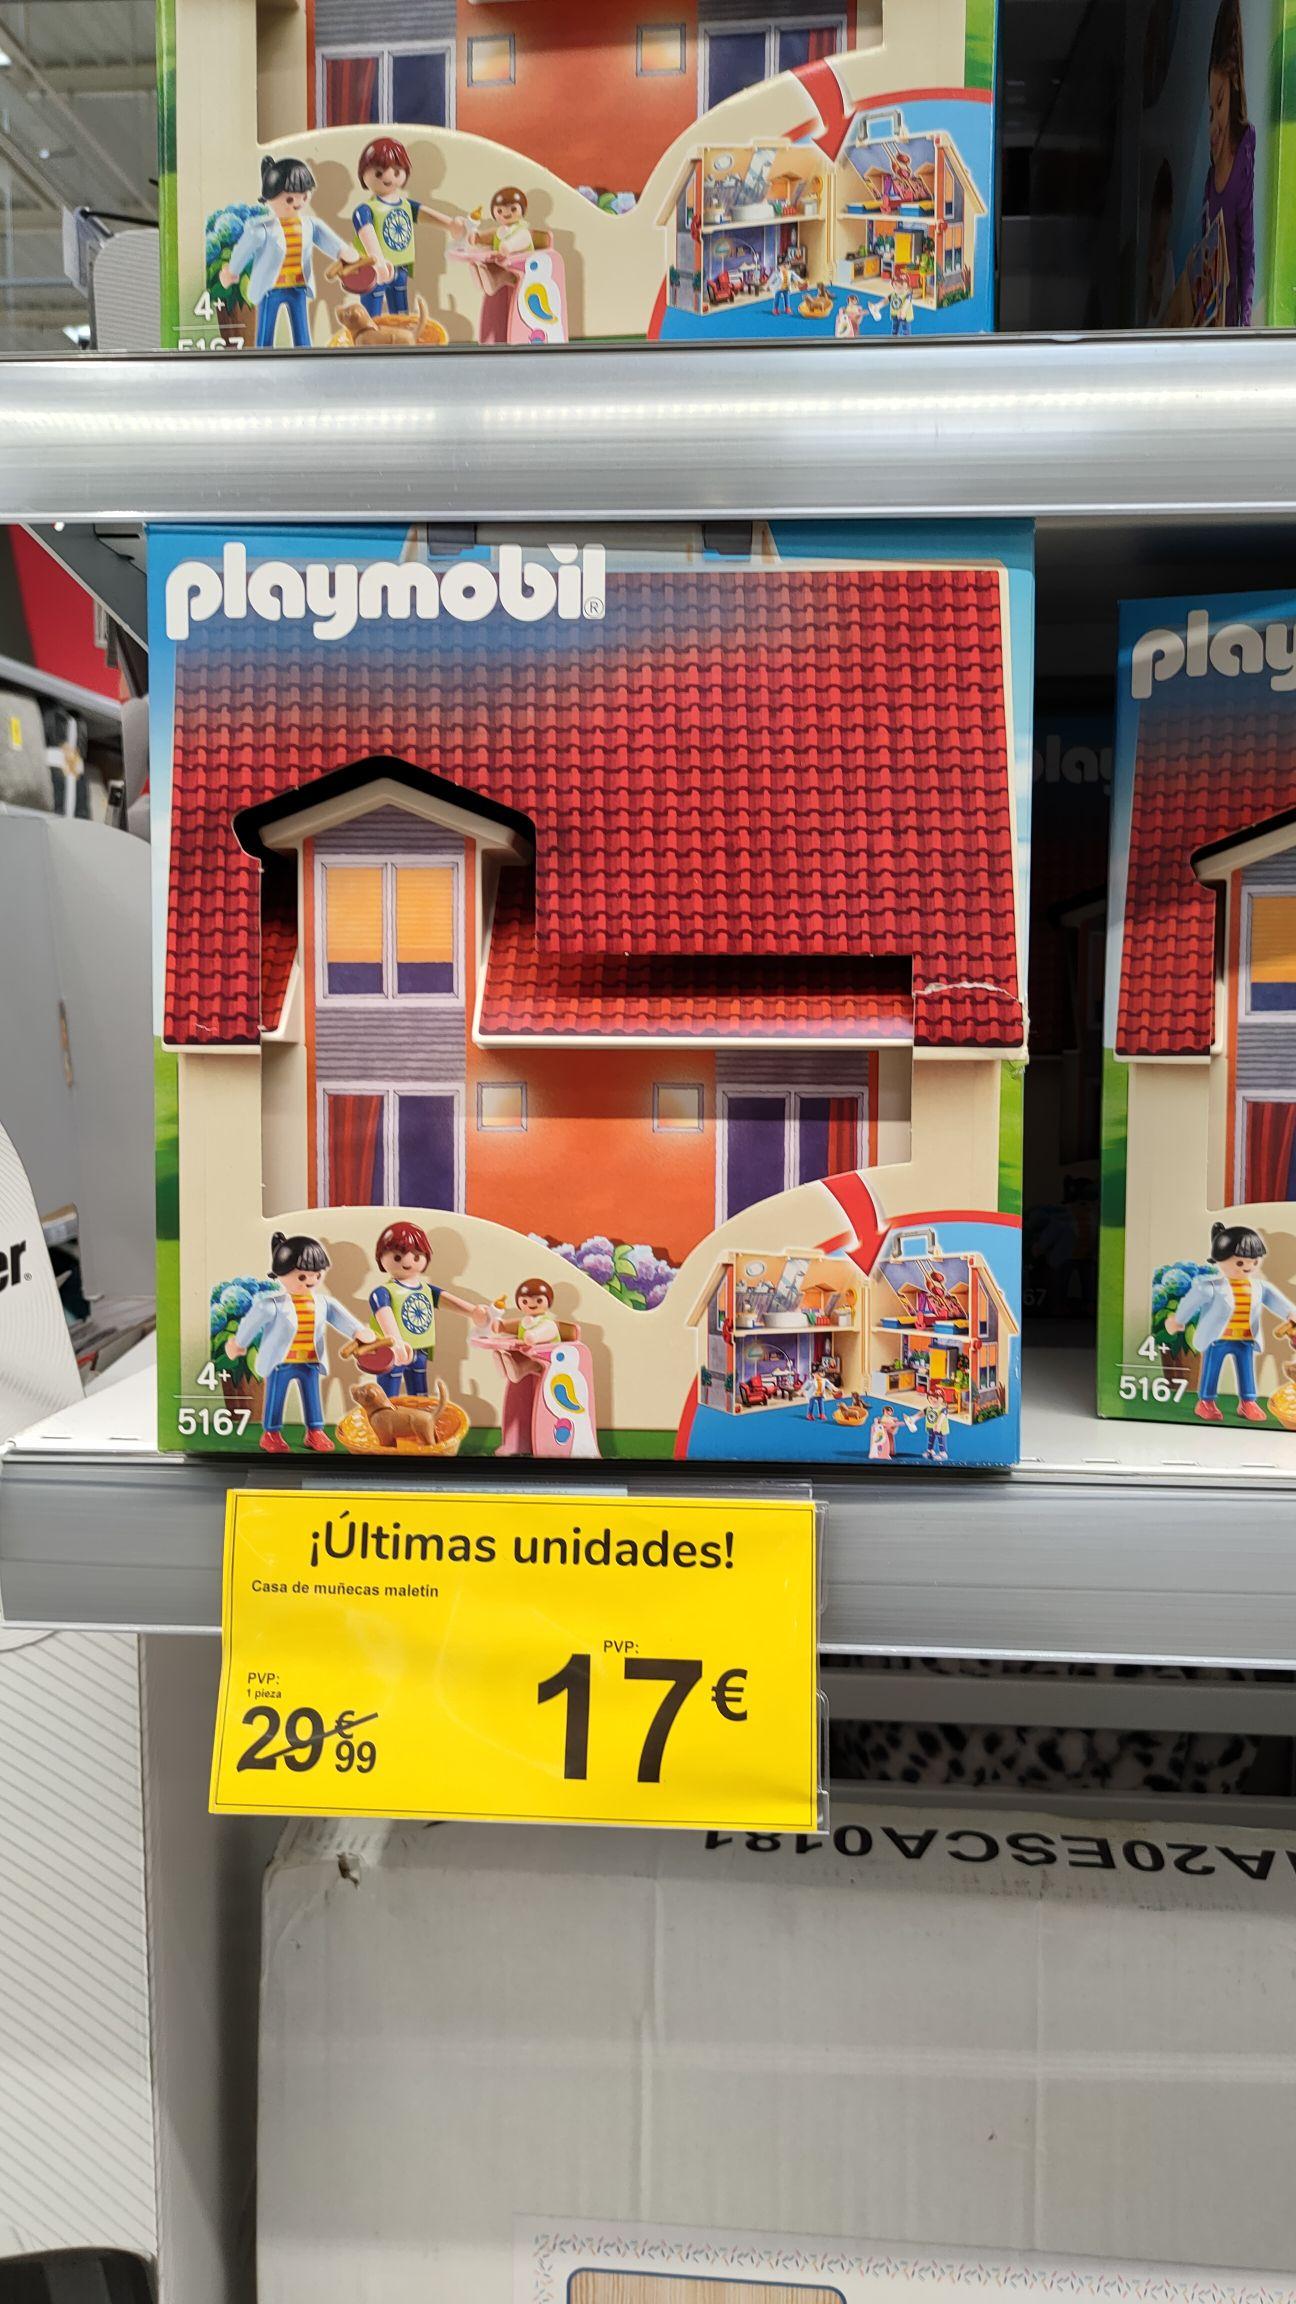 Casa de muñecas Playmobil (Carrefour Valle Real)